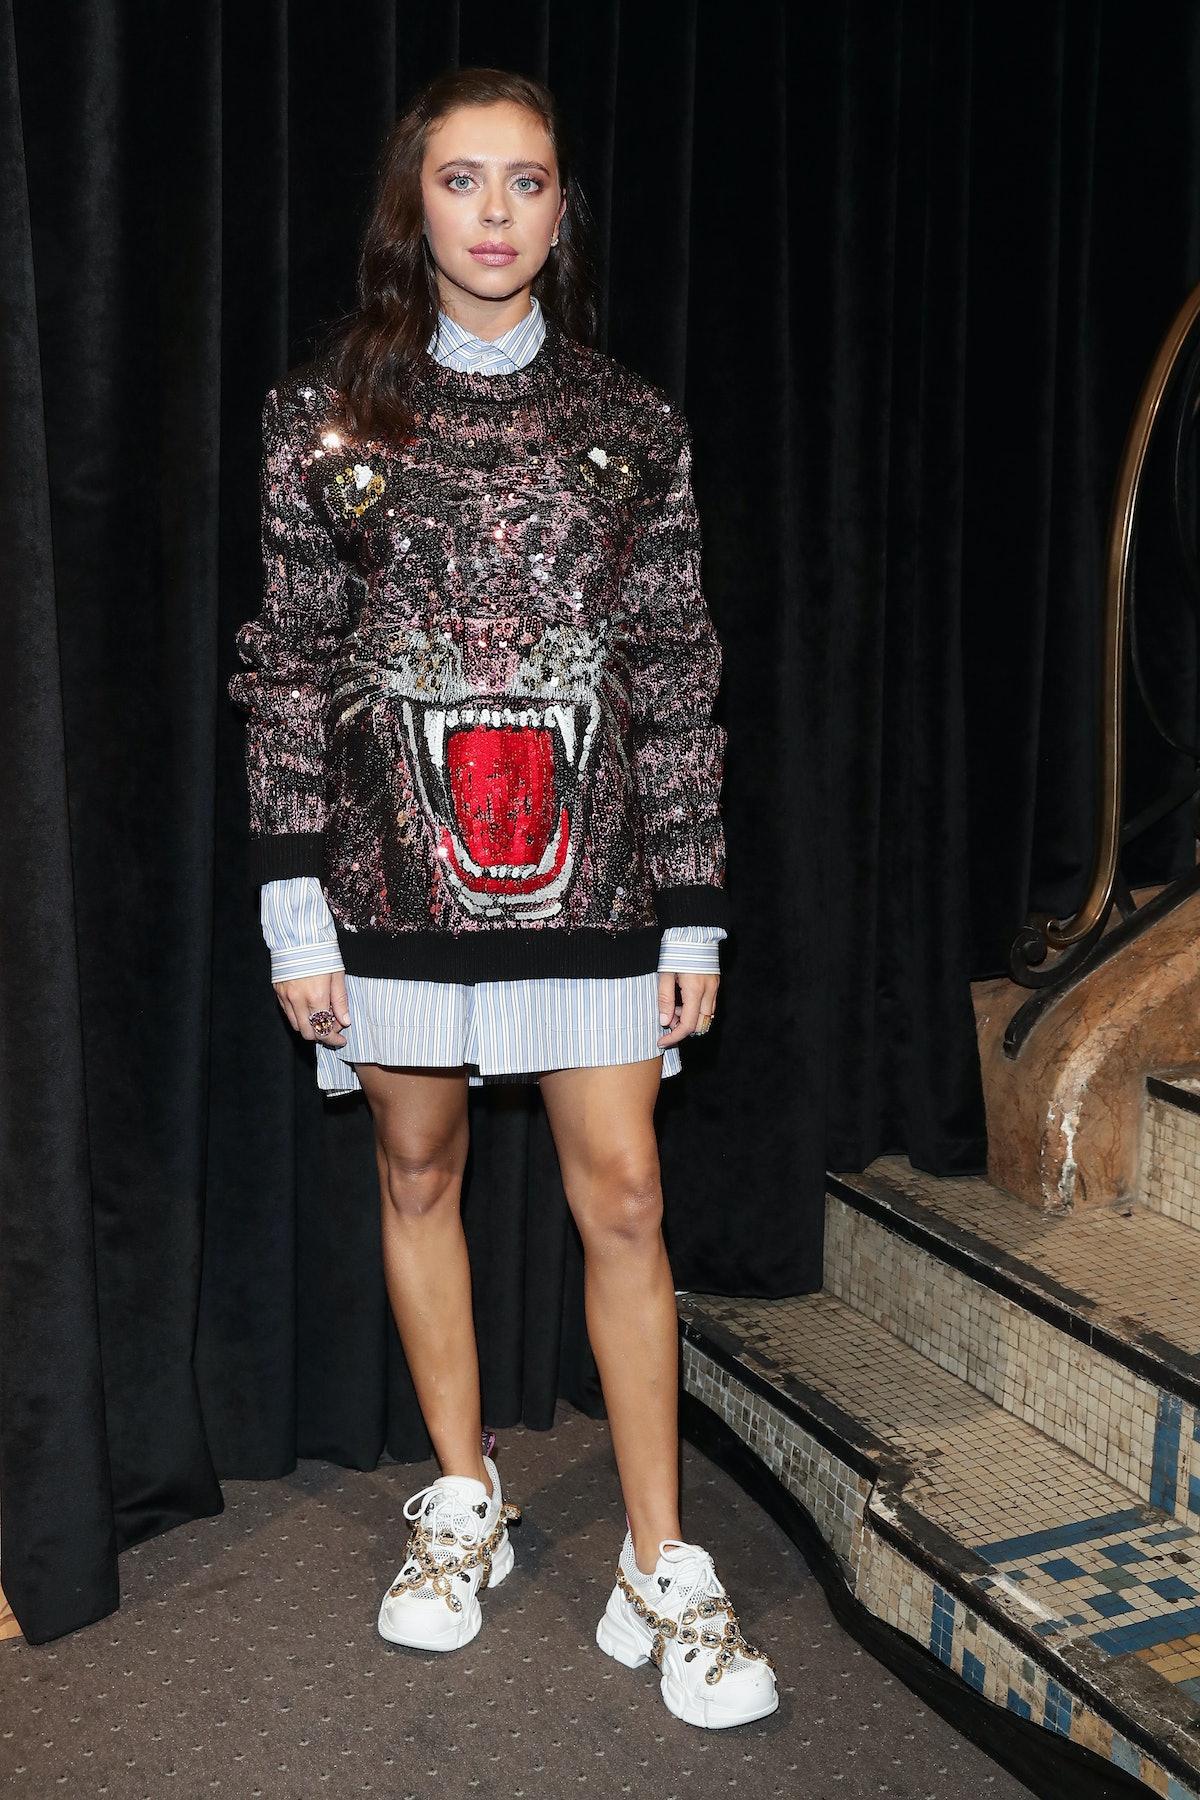 Gucci - Arrivals - Paris Fashion Week Spring/Summer 2019